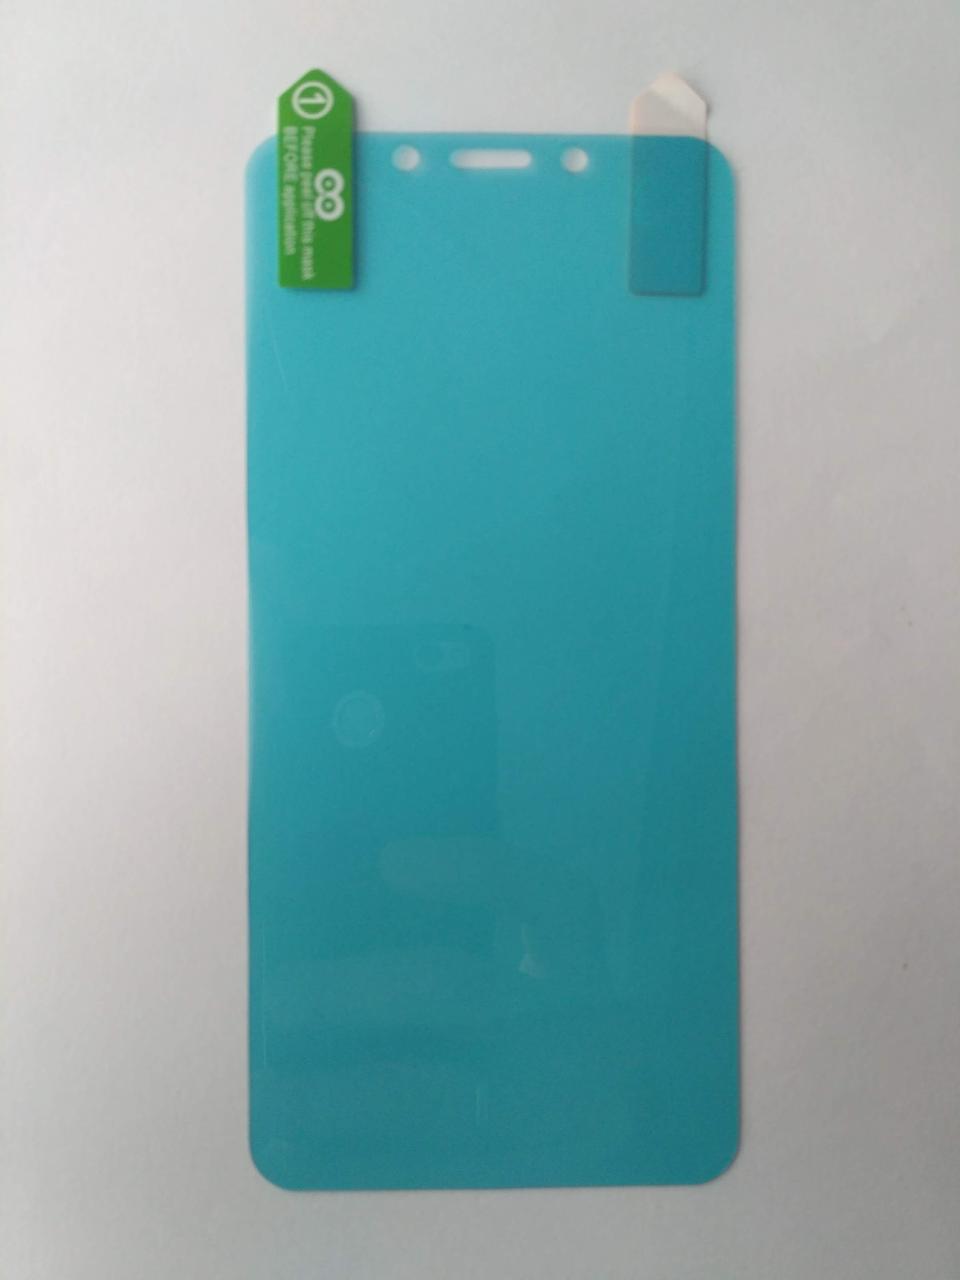 Пленка для Xiaomi Redmi 6a глянцевая ударопрочная